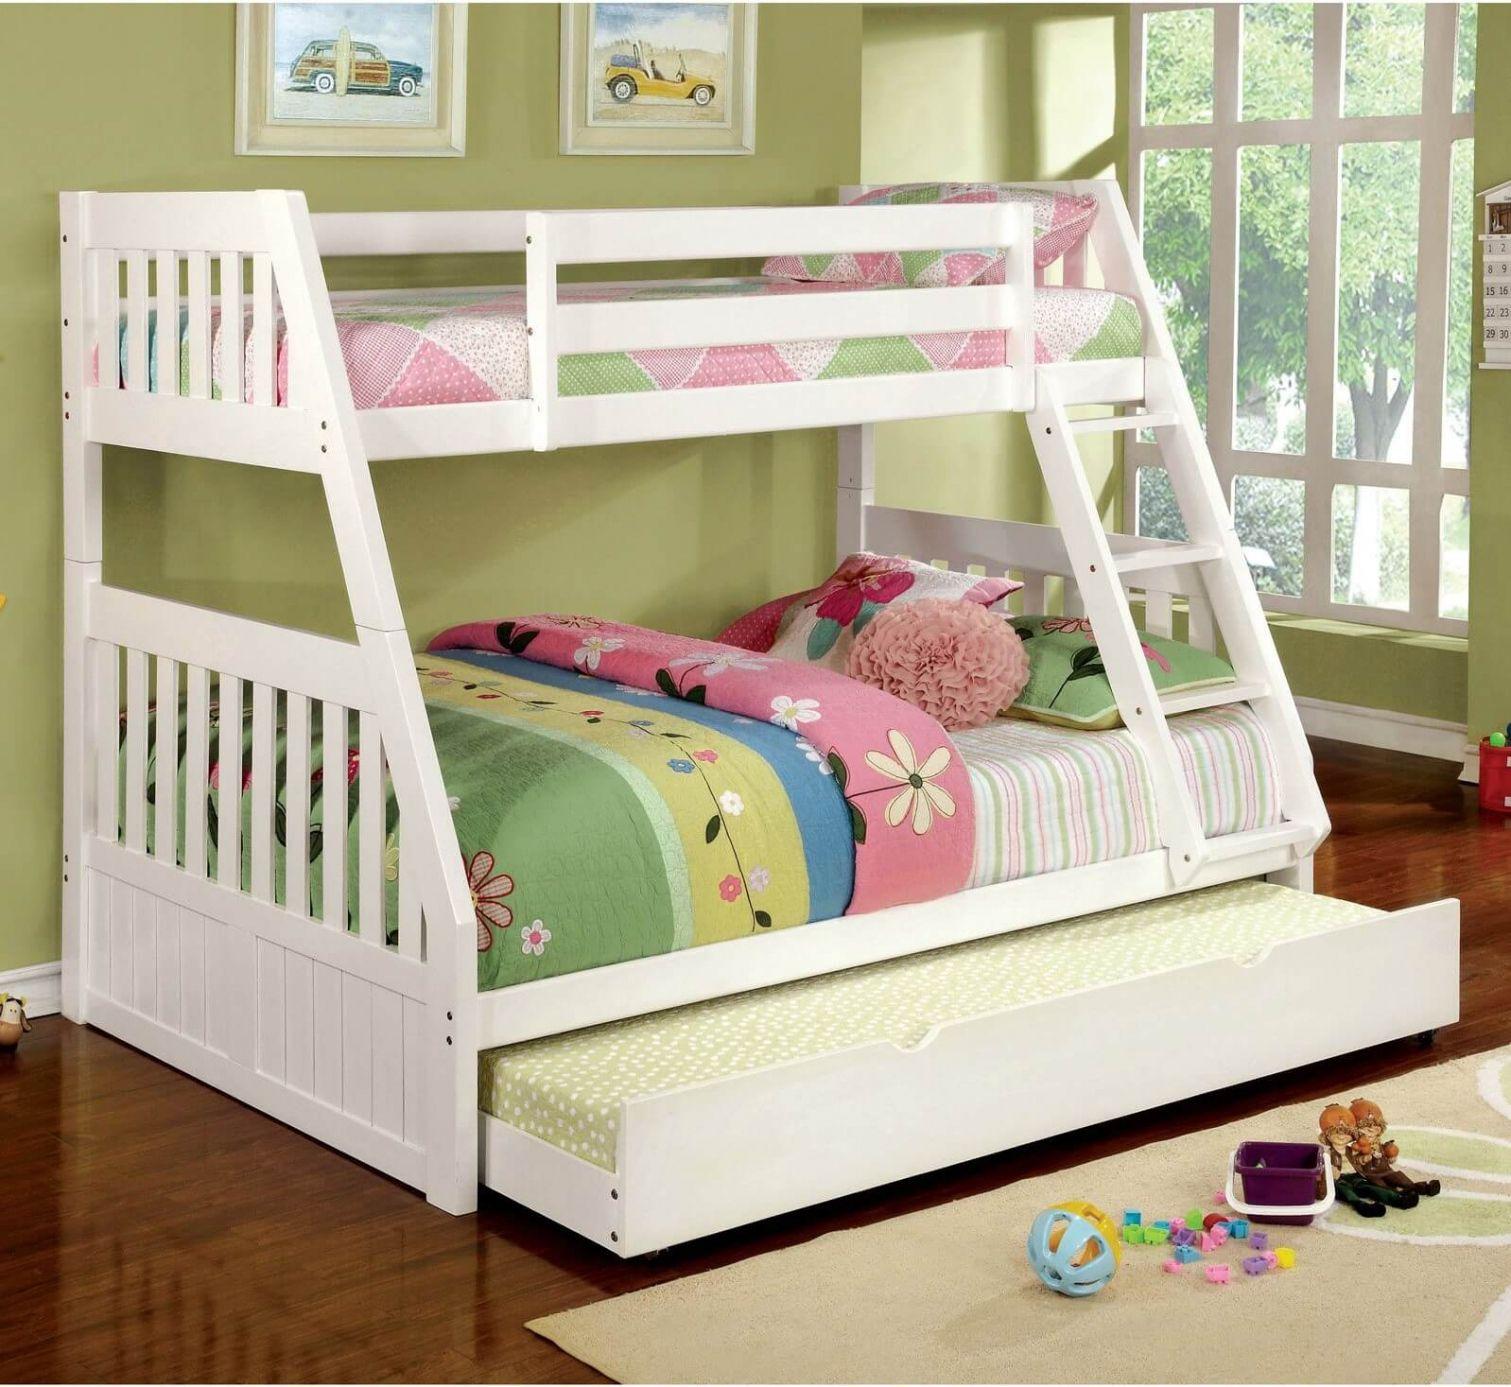 30 Twin Mattress for Bunk Beds Interior Design Bedroom Ideas